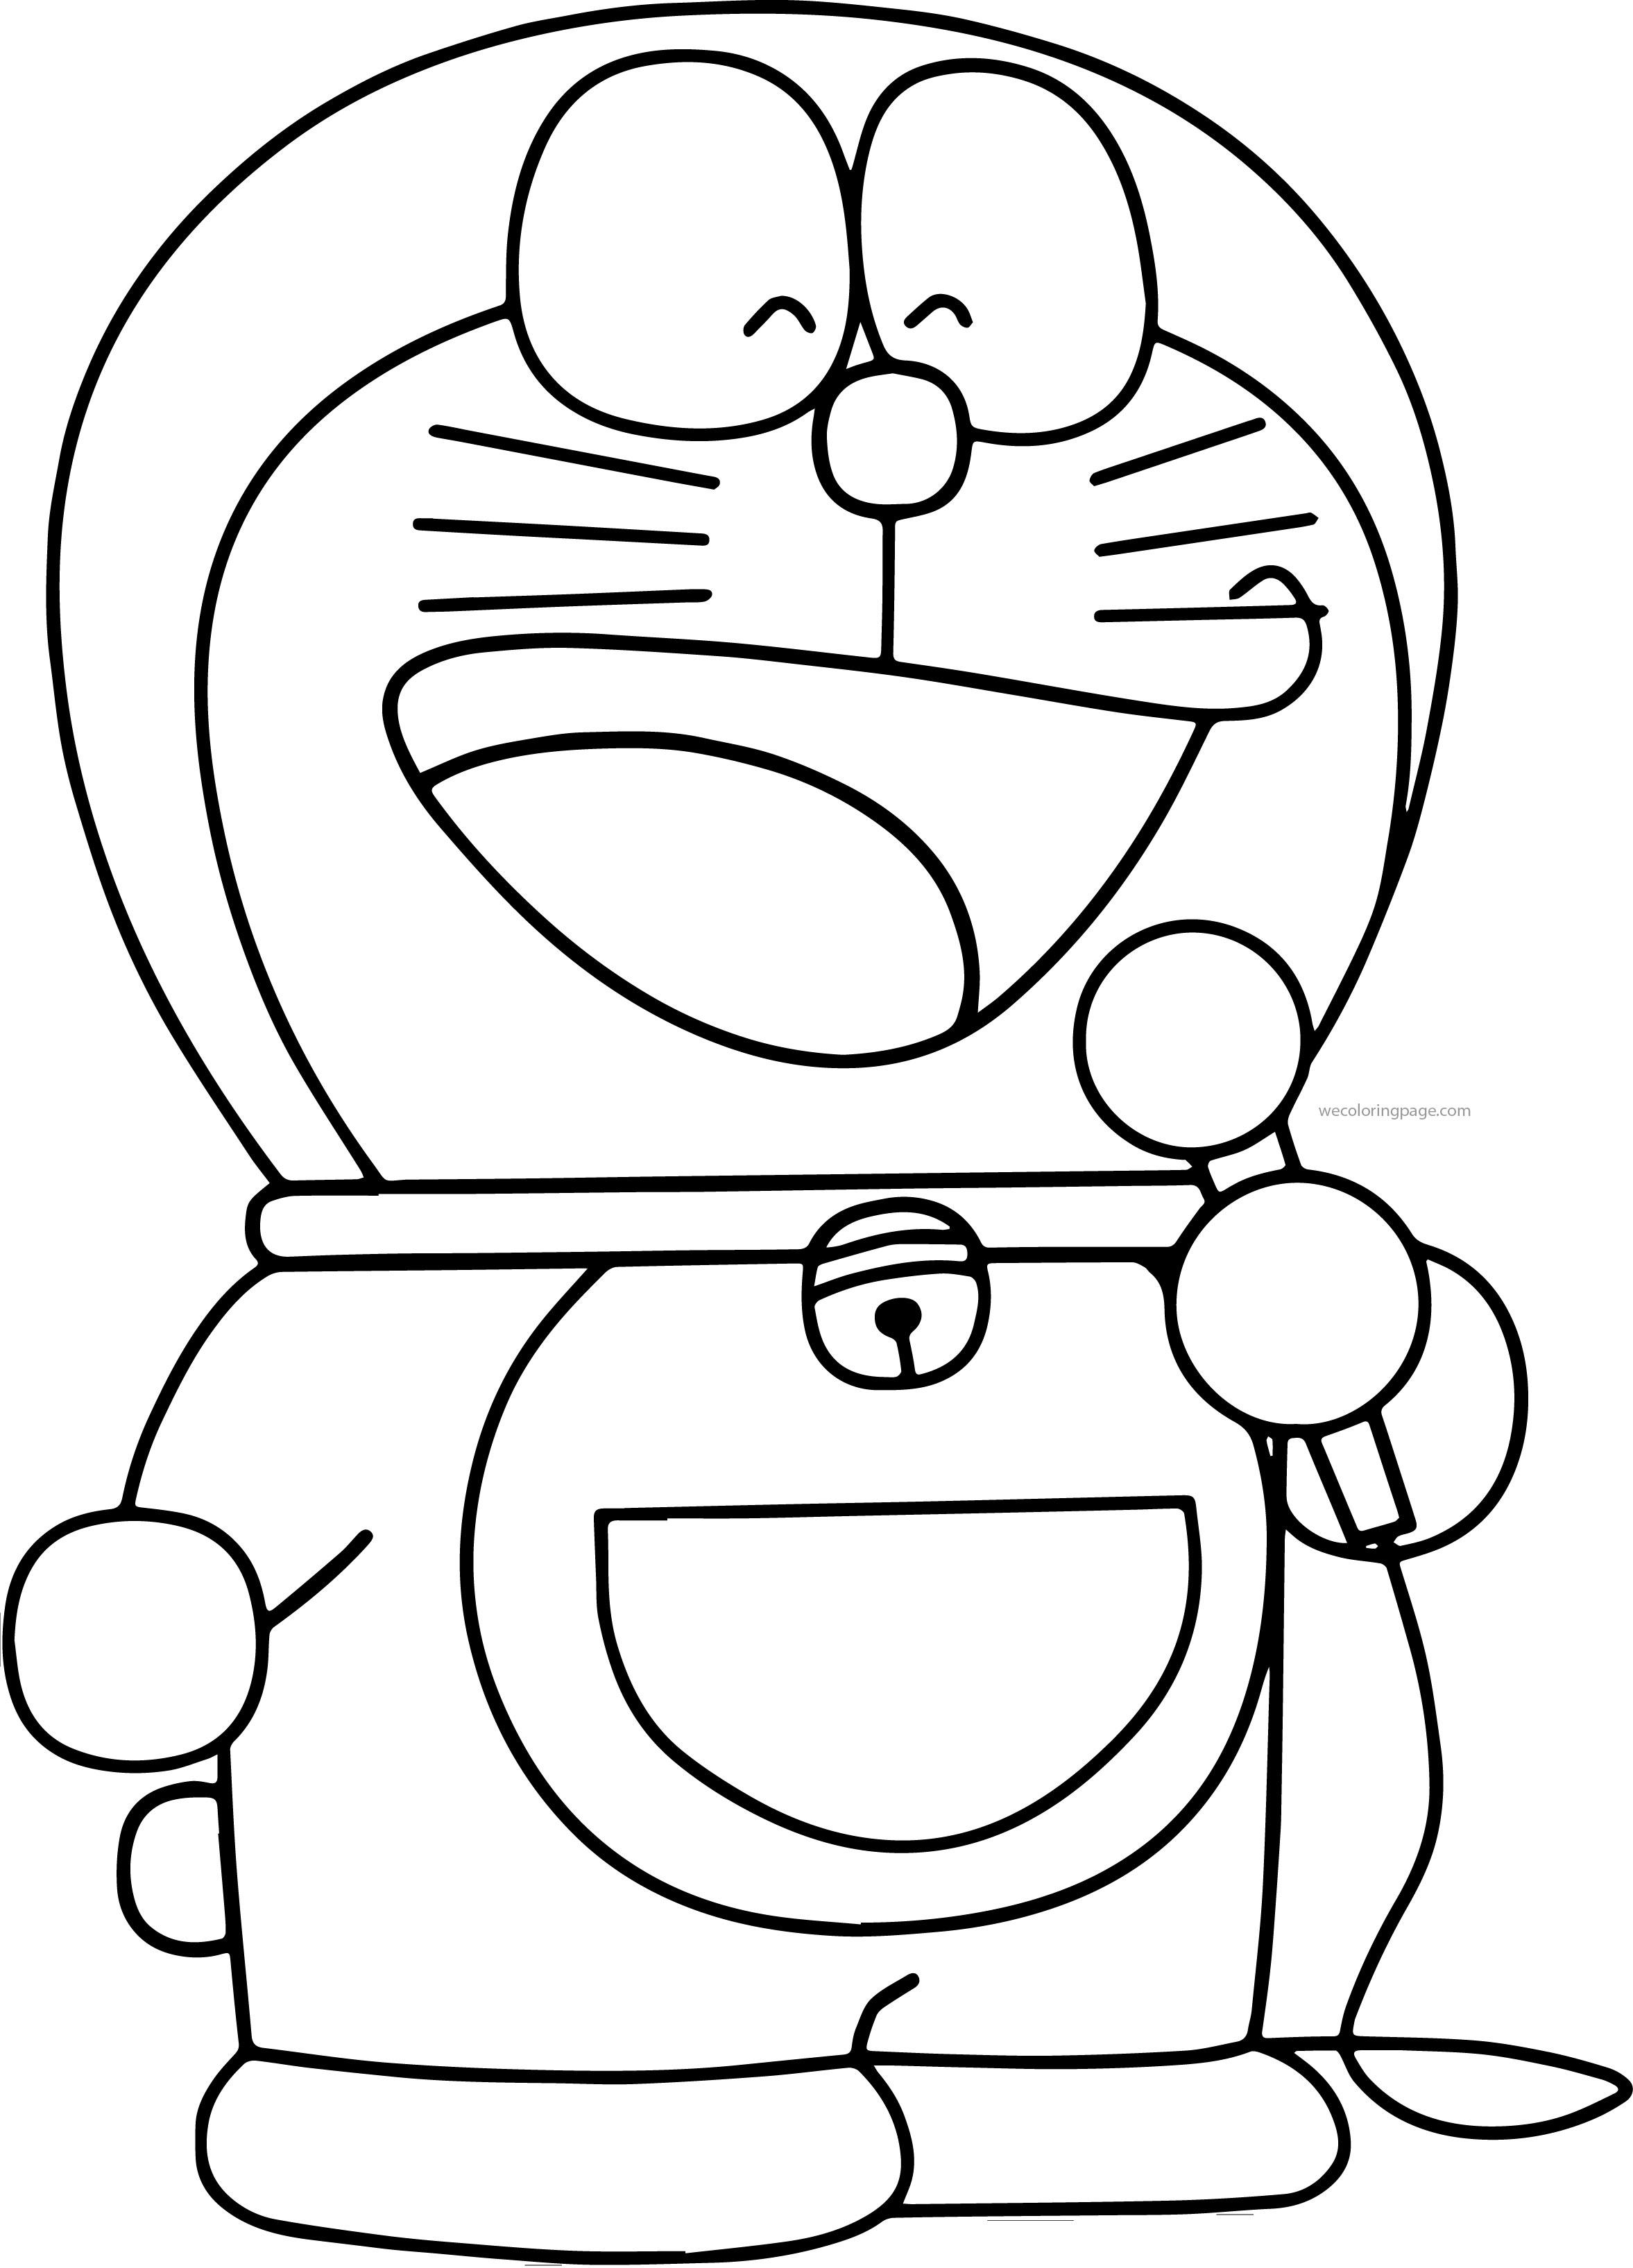 Doraemon Bratz Song Coloring Page